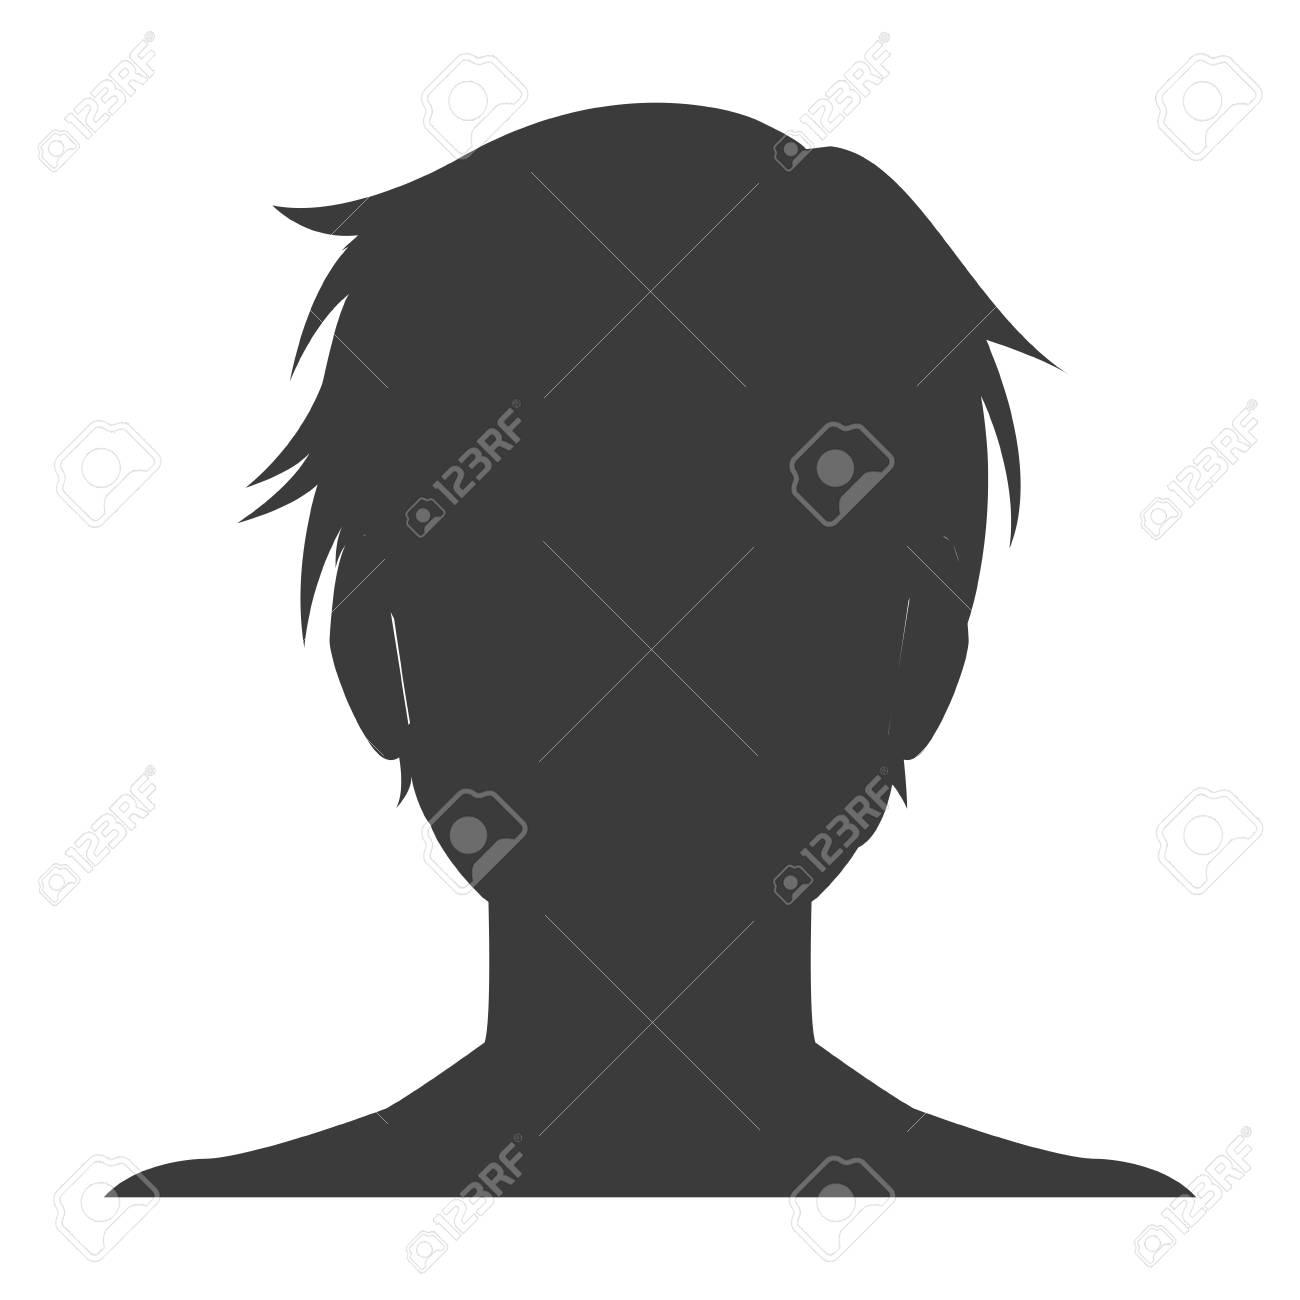 Silhouette head boy anime avatar image vector illustration stock vector 77853721